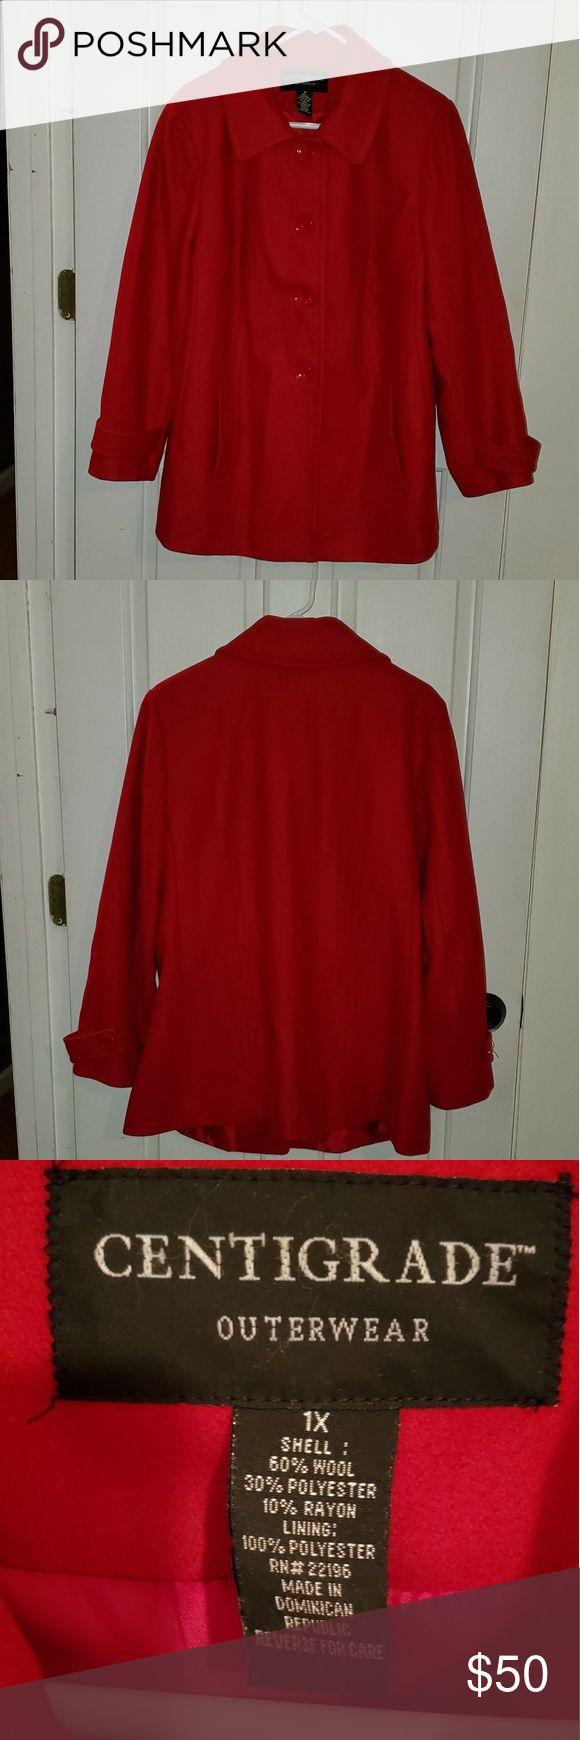 Centigrade Outerwear Jacket Outerwear Jackets Clothes Design Outerwear [ 1740 x 580 Pixel ]